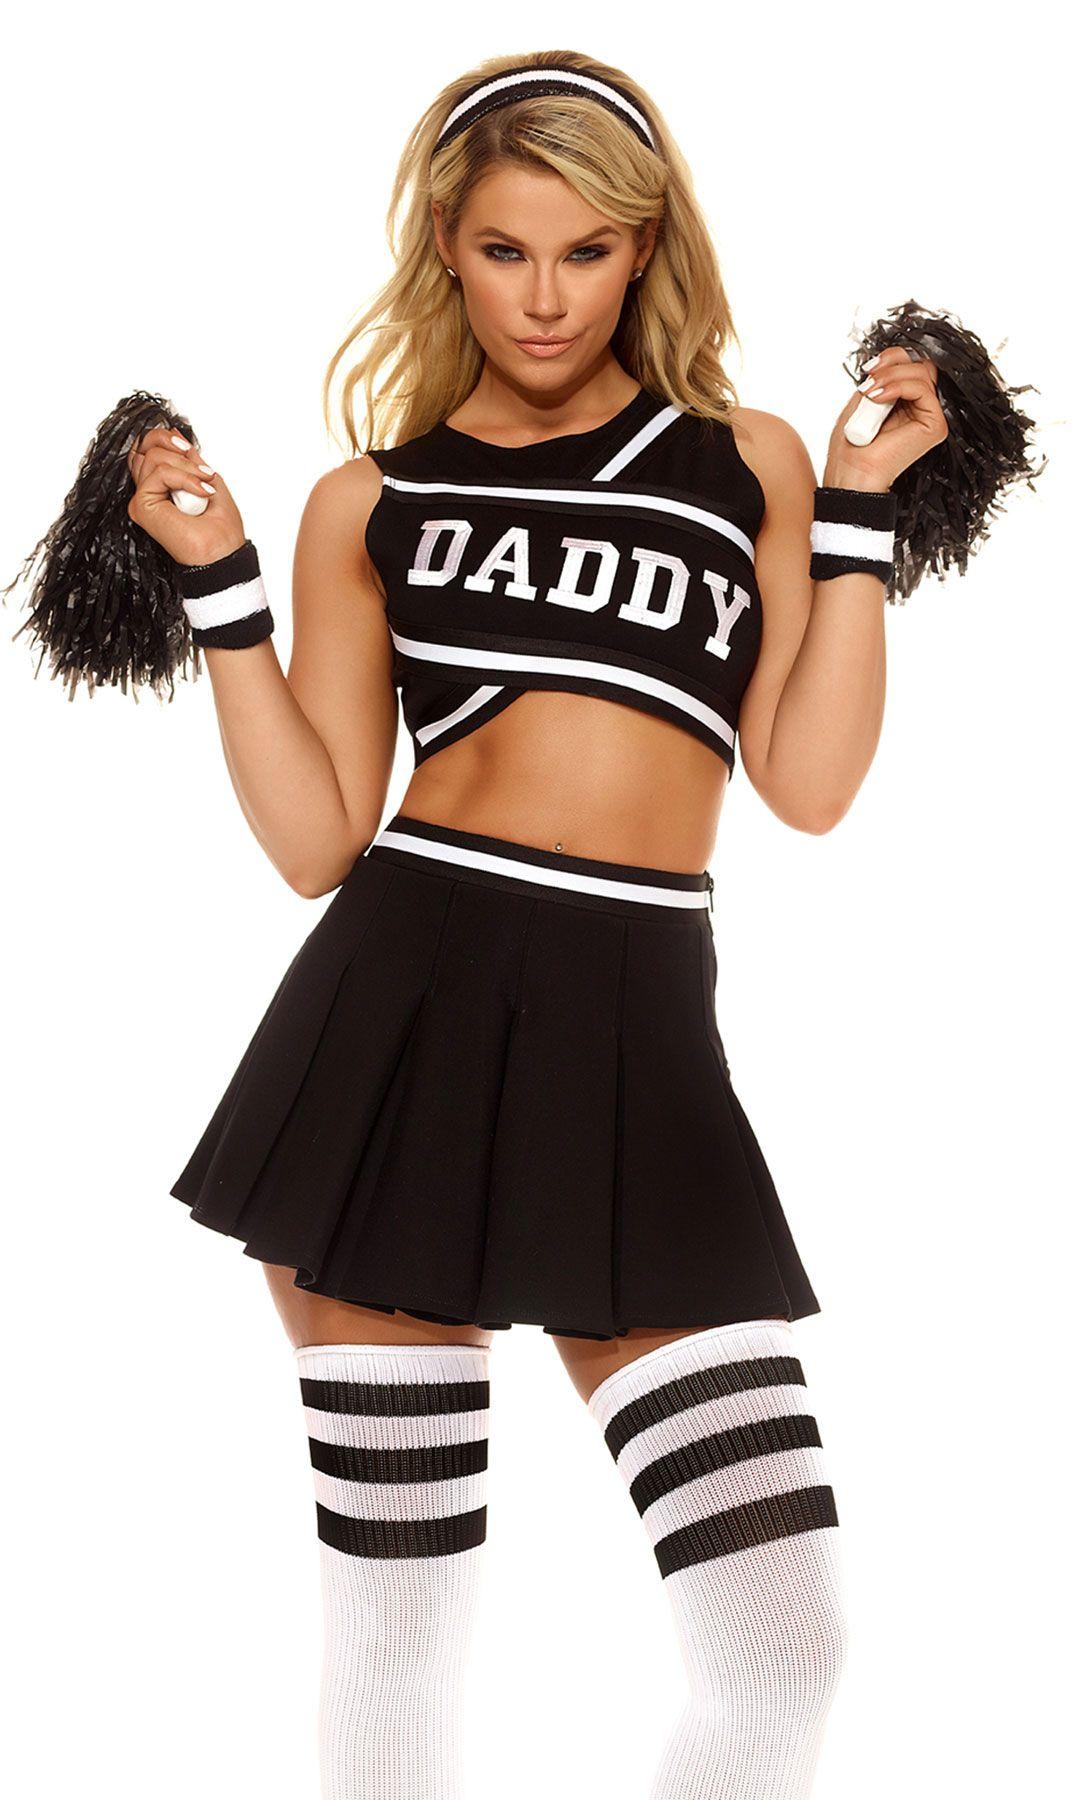 Costume School (Forplay): Daddy Cheerleader: Top, Skirt, Headband ...